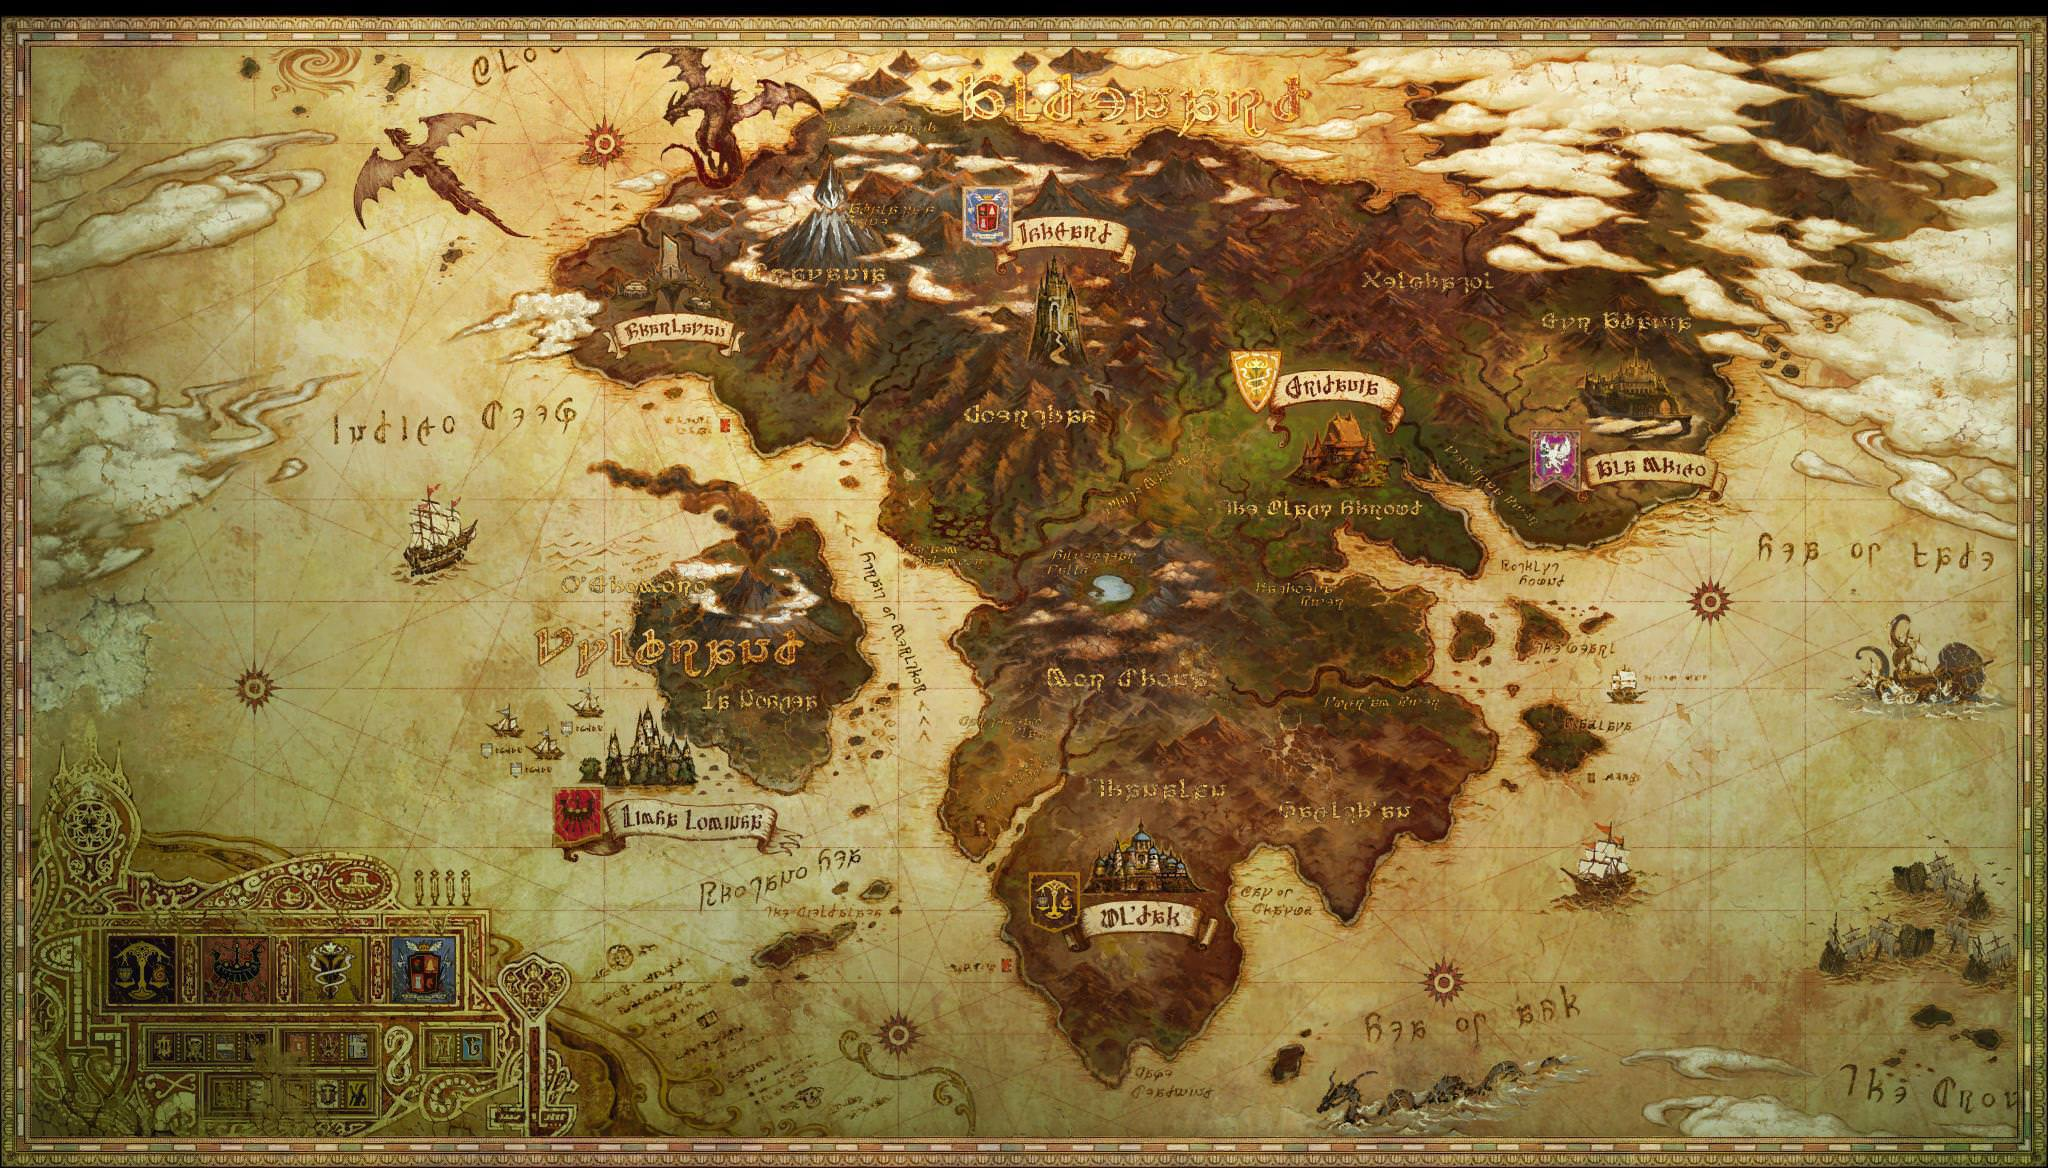 Imagen eorzea mapg final fantasy wiki fandom powered by wikia eorzea mapg gumiabroncs Choice Image